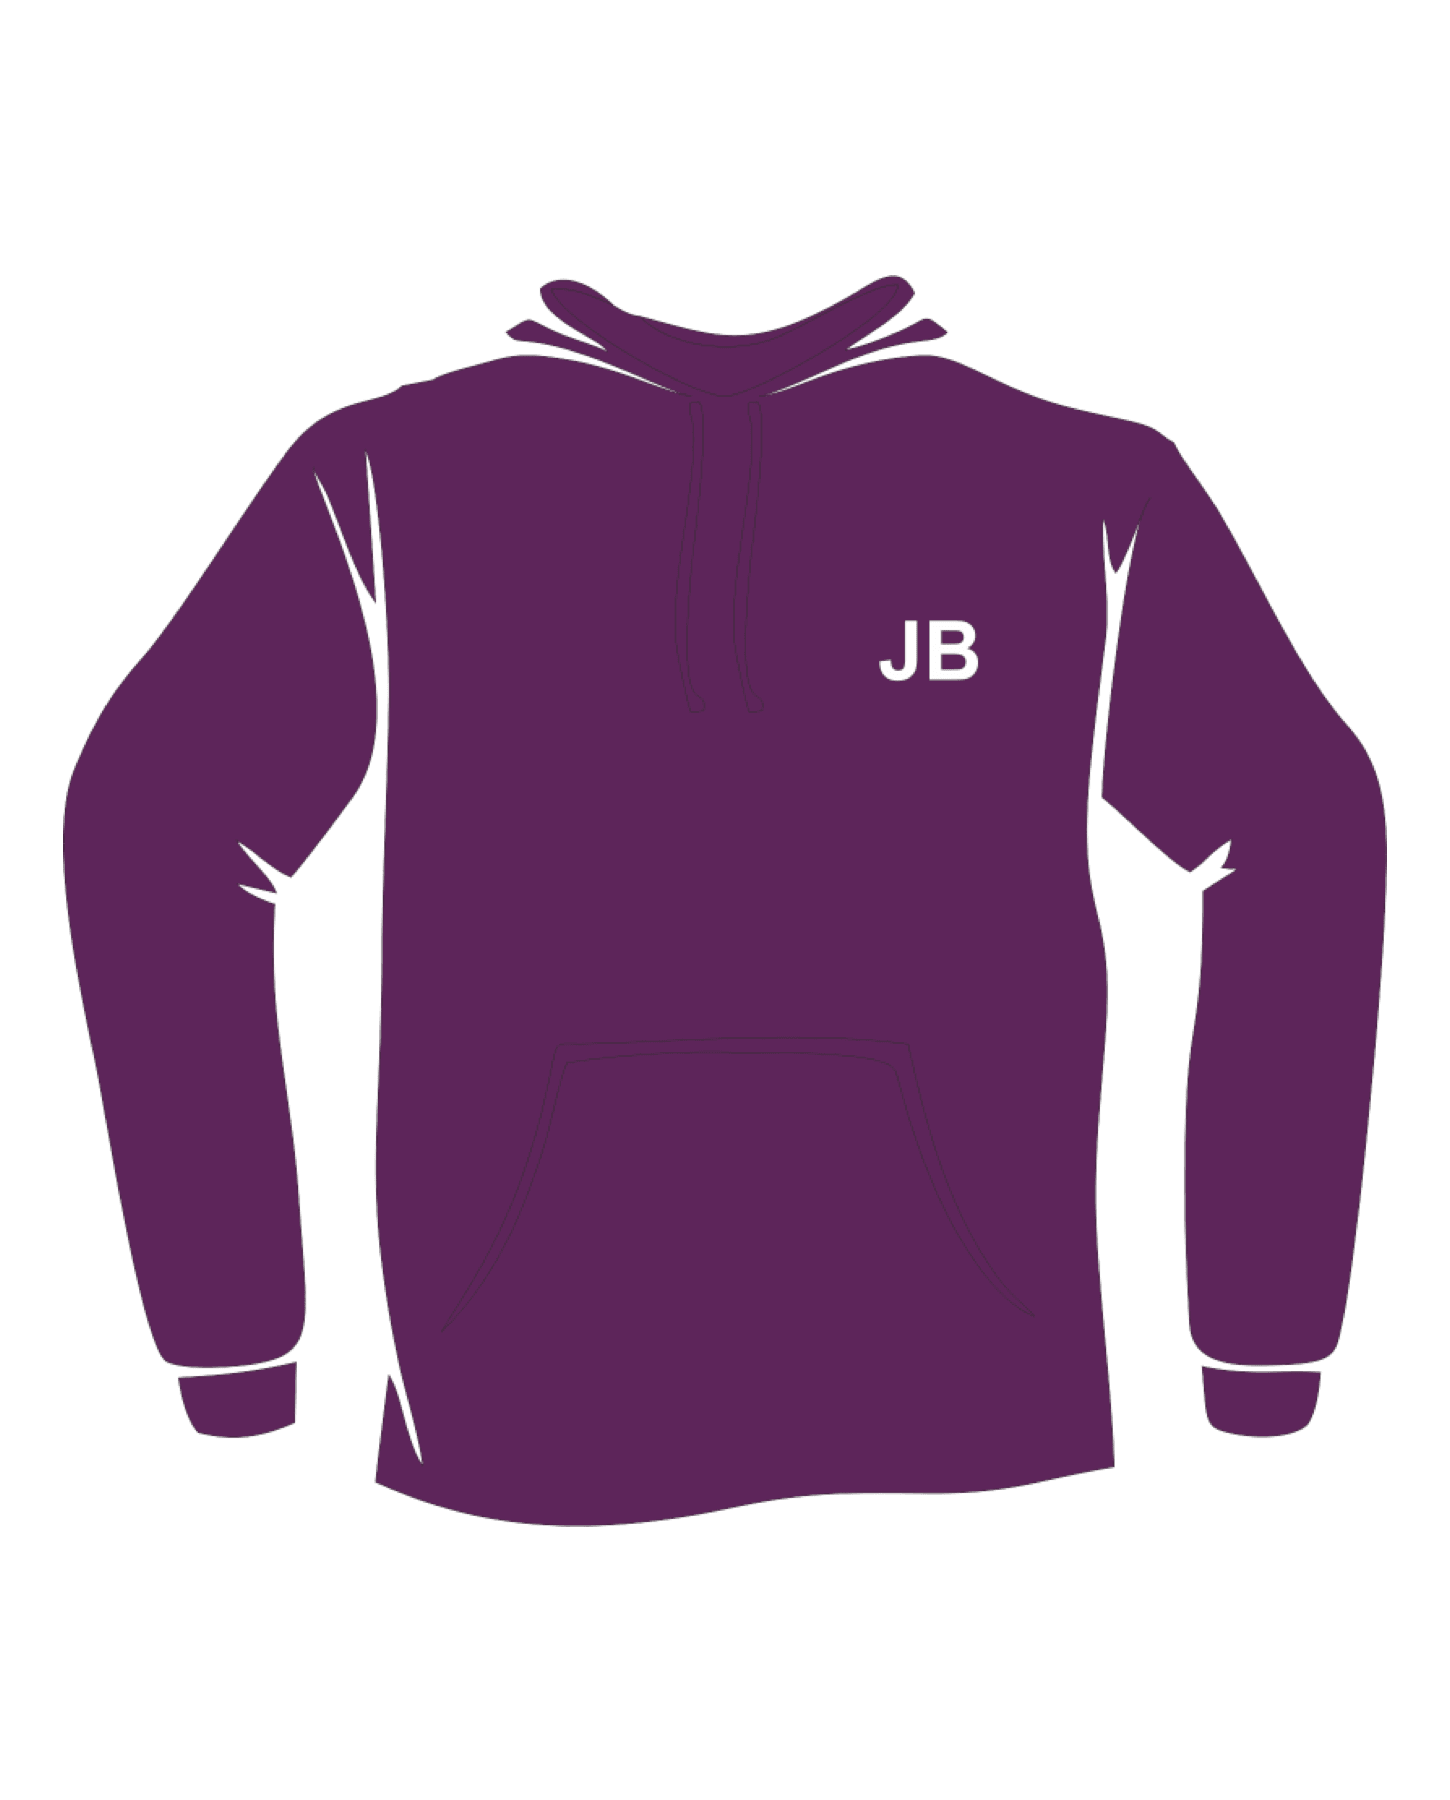 Cottenham Jaguars Netball Club – Hoodie Adults